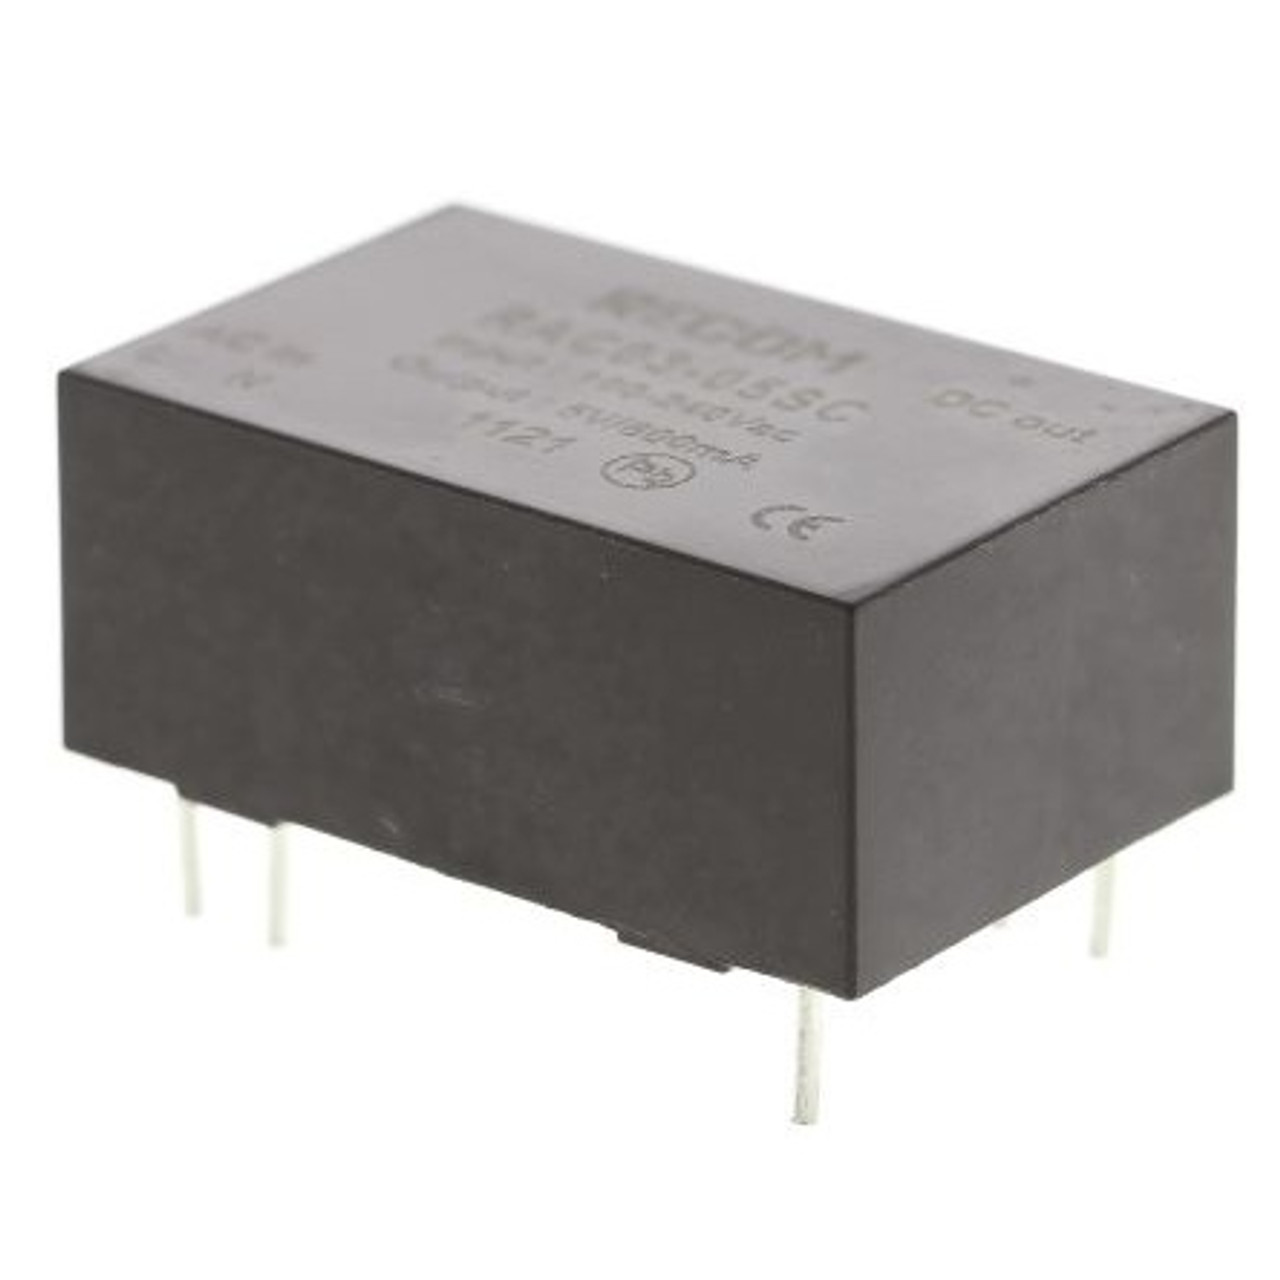 Gazechimp 24V 500mA AC To DC Power Supply Board Module